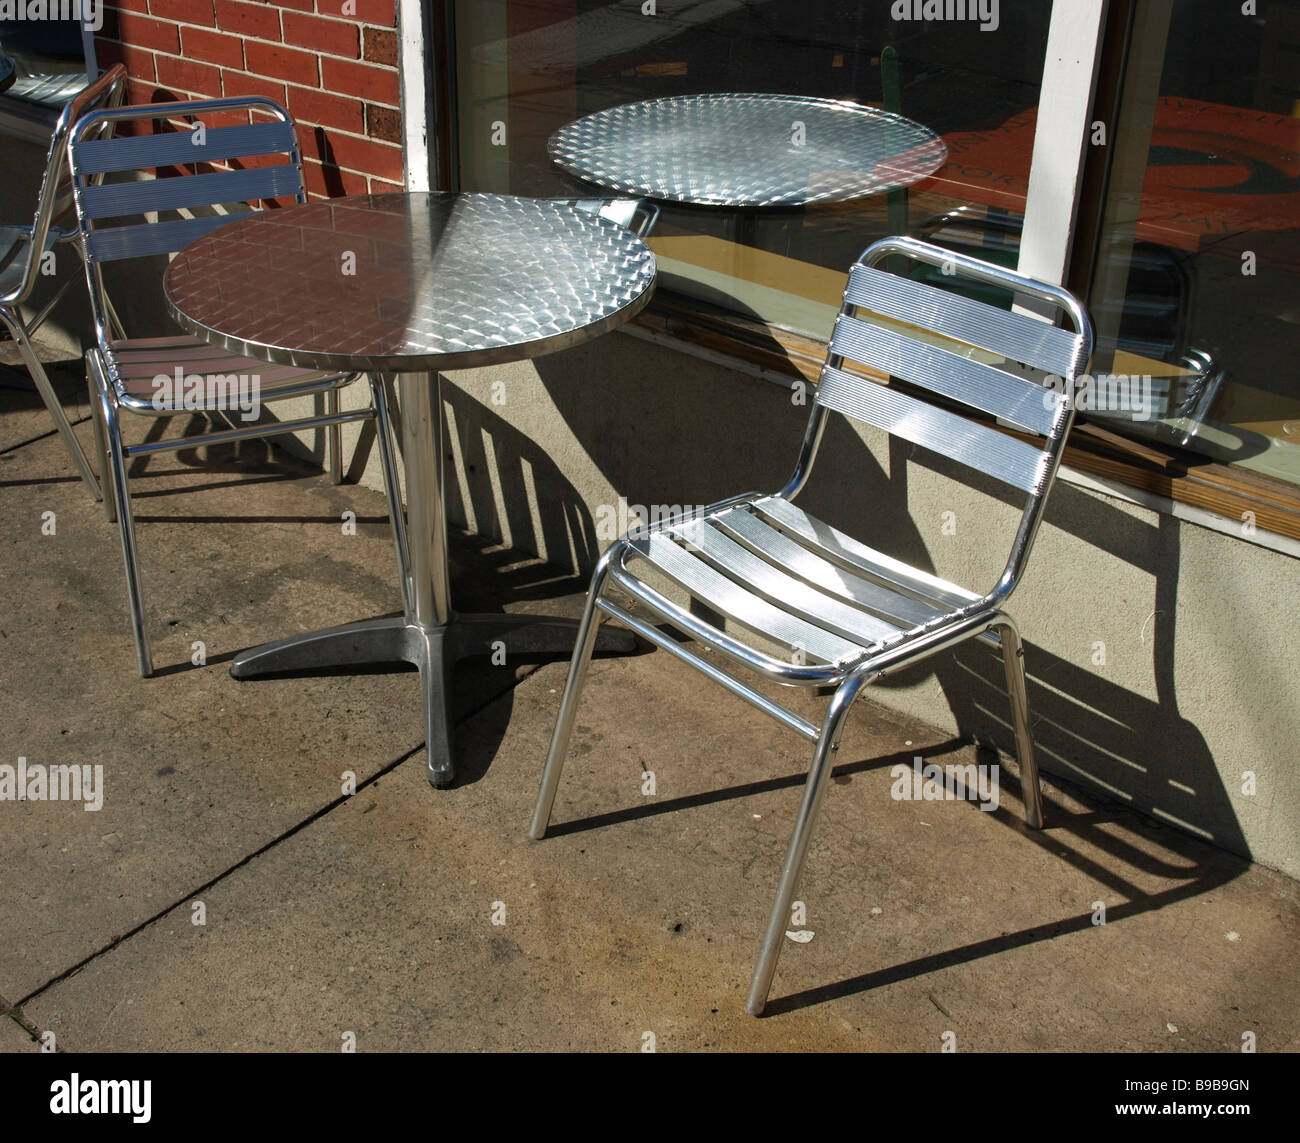 Stupendous Outdoor Metal Table Chairs On Cement Walk Near Brick Wall Uwap Interior Chair Design Uwaporg